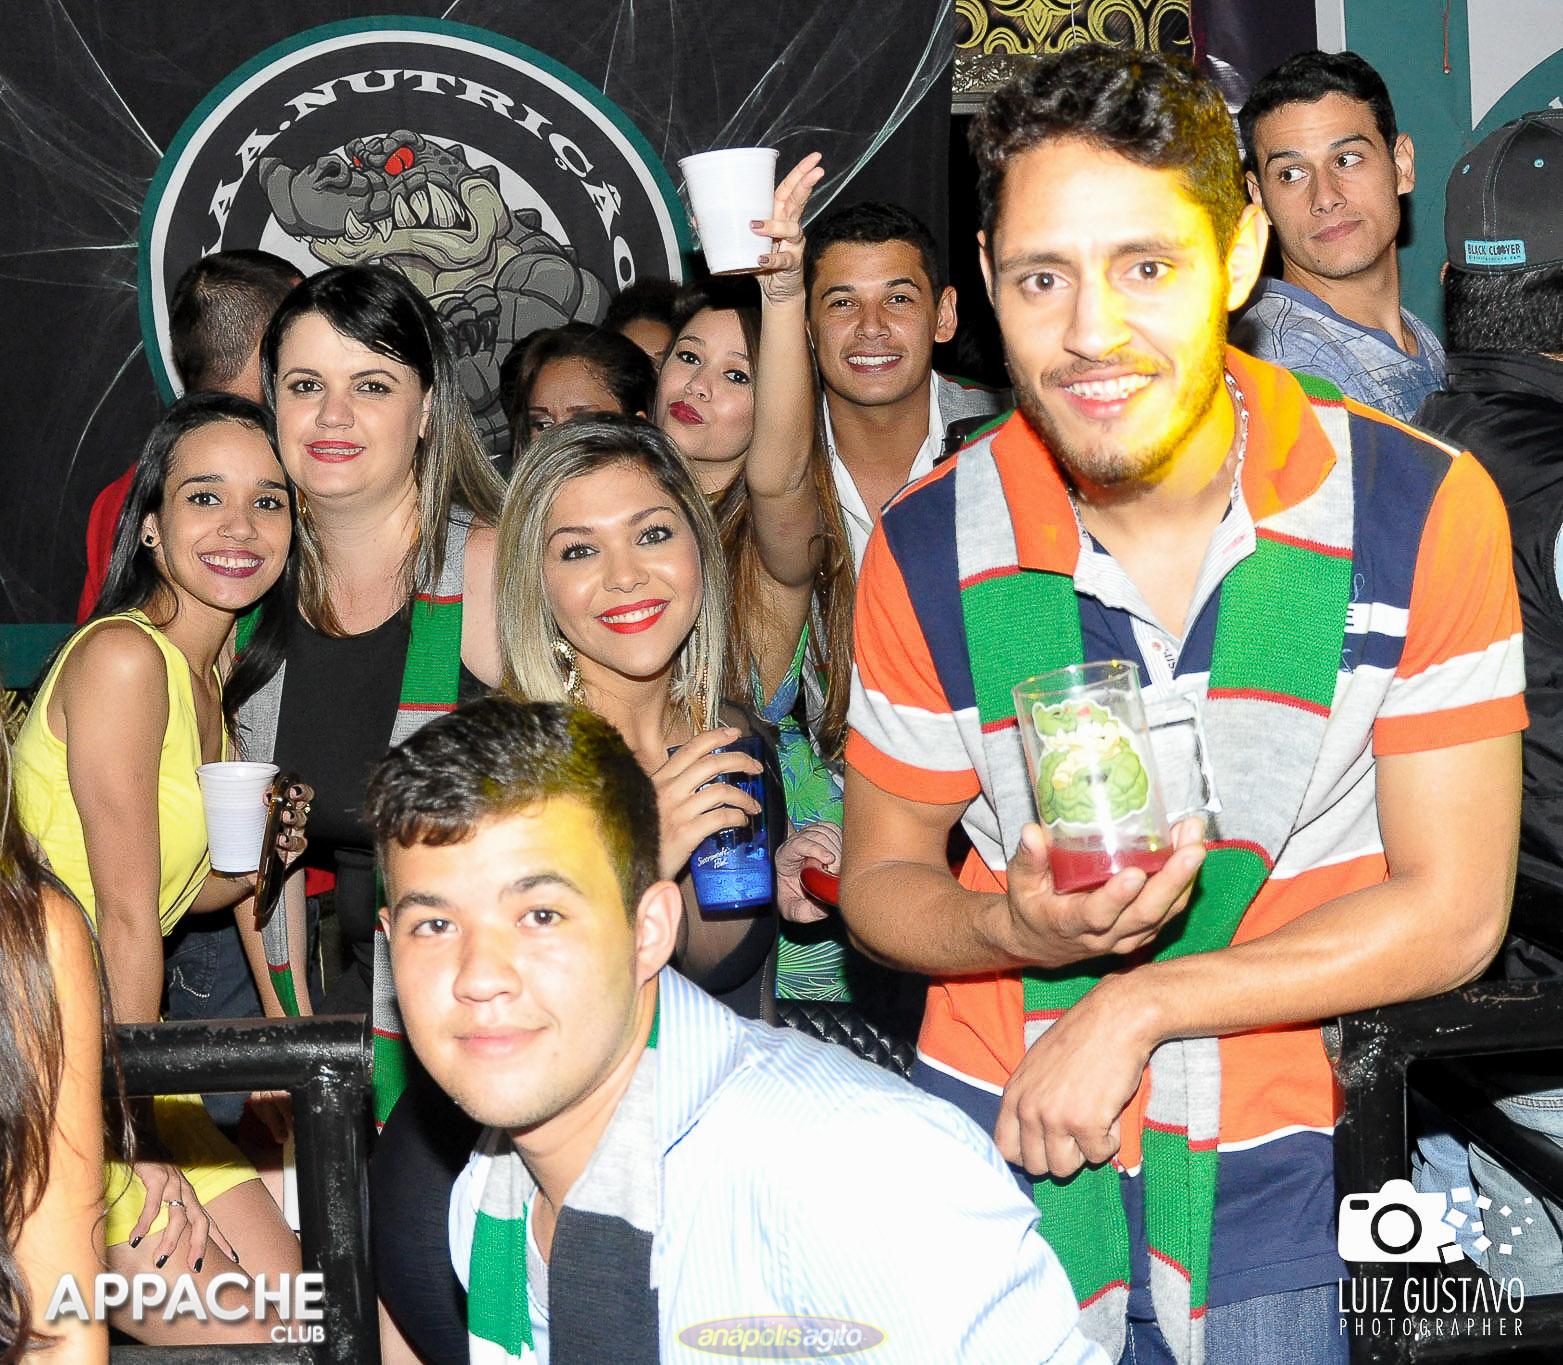 Luiz Gustavo Photographer-19